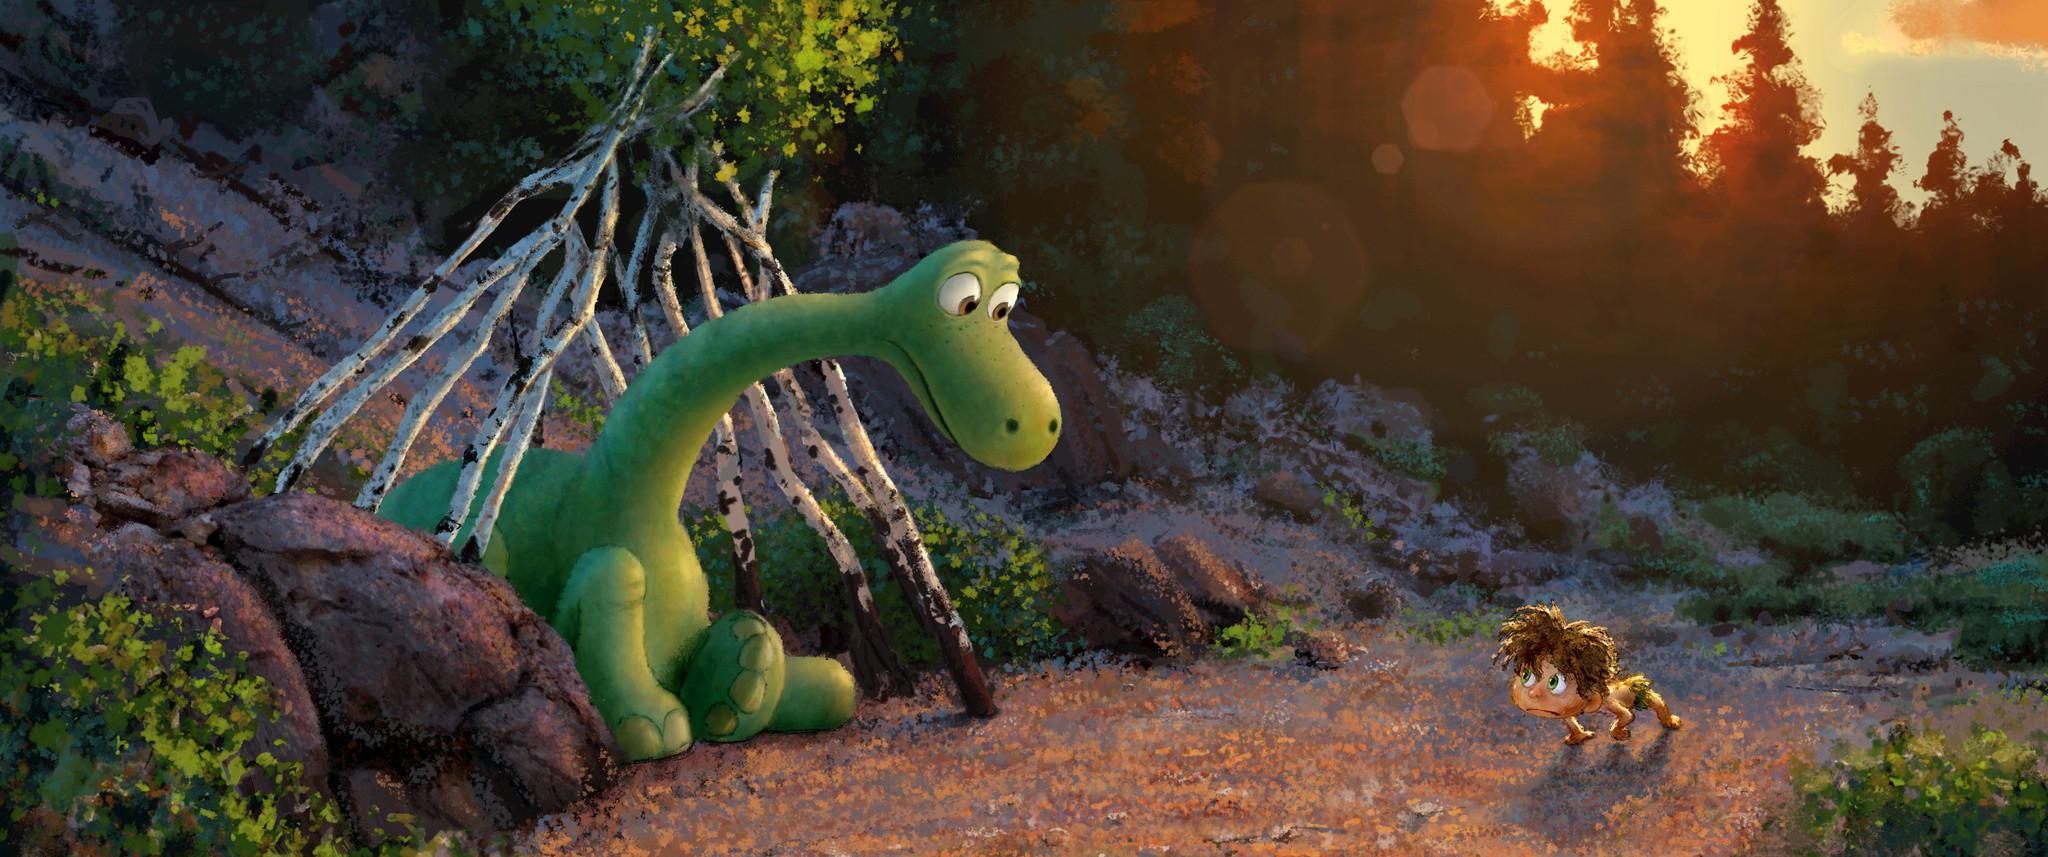 The Good Dinosaur van Pixar